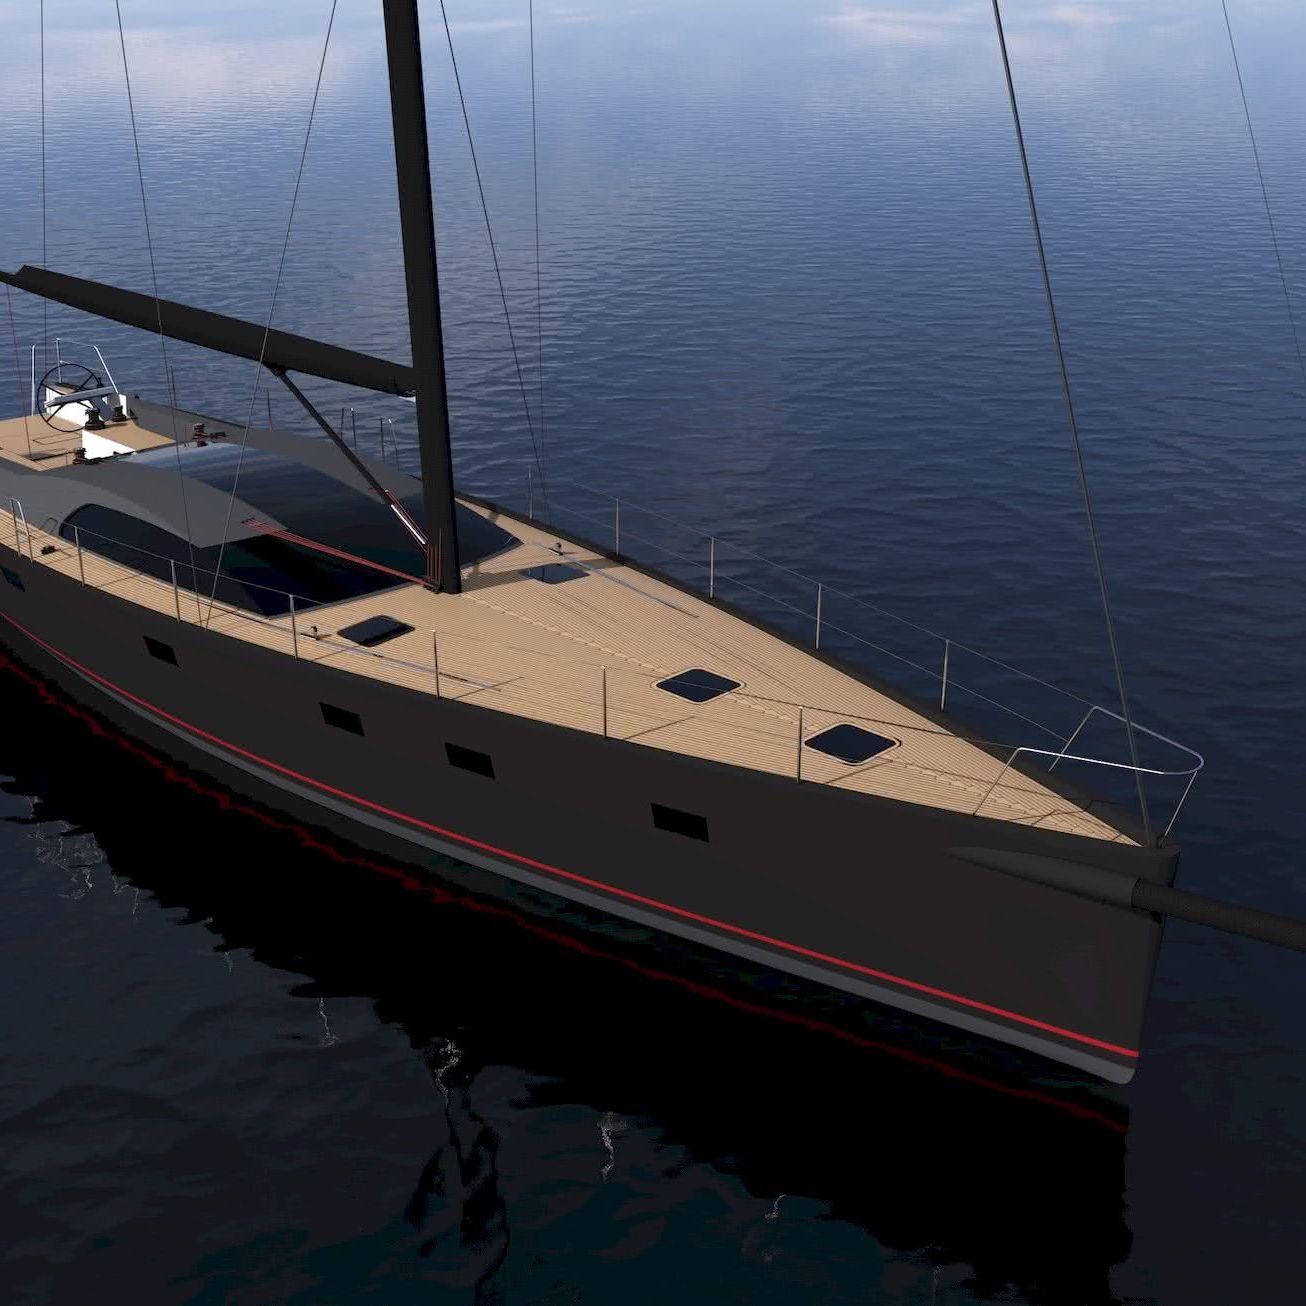 20m Sailing Yacht Marcelo Penna Yacht Design MP670S